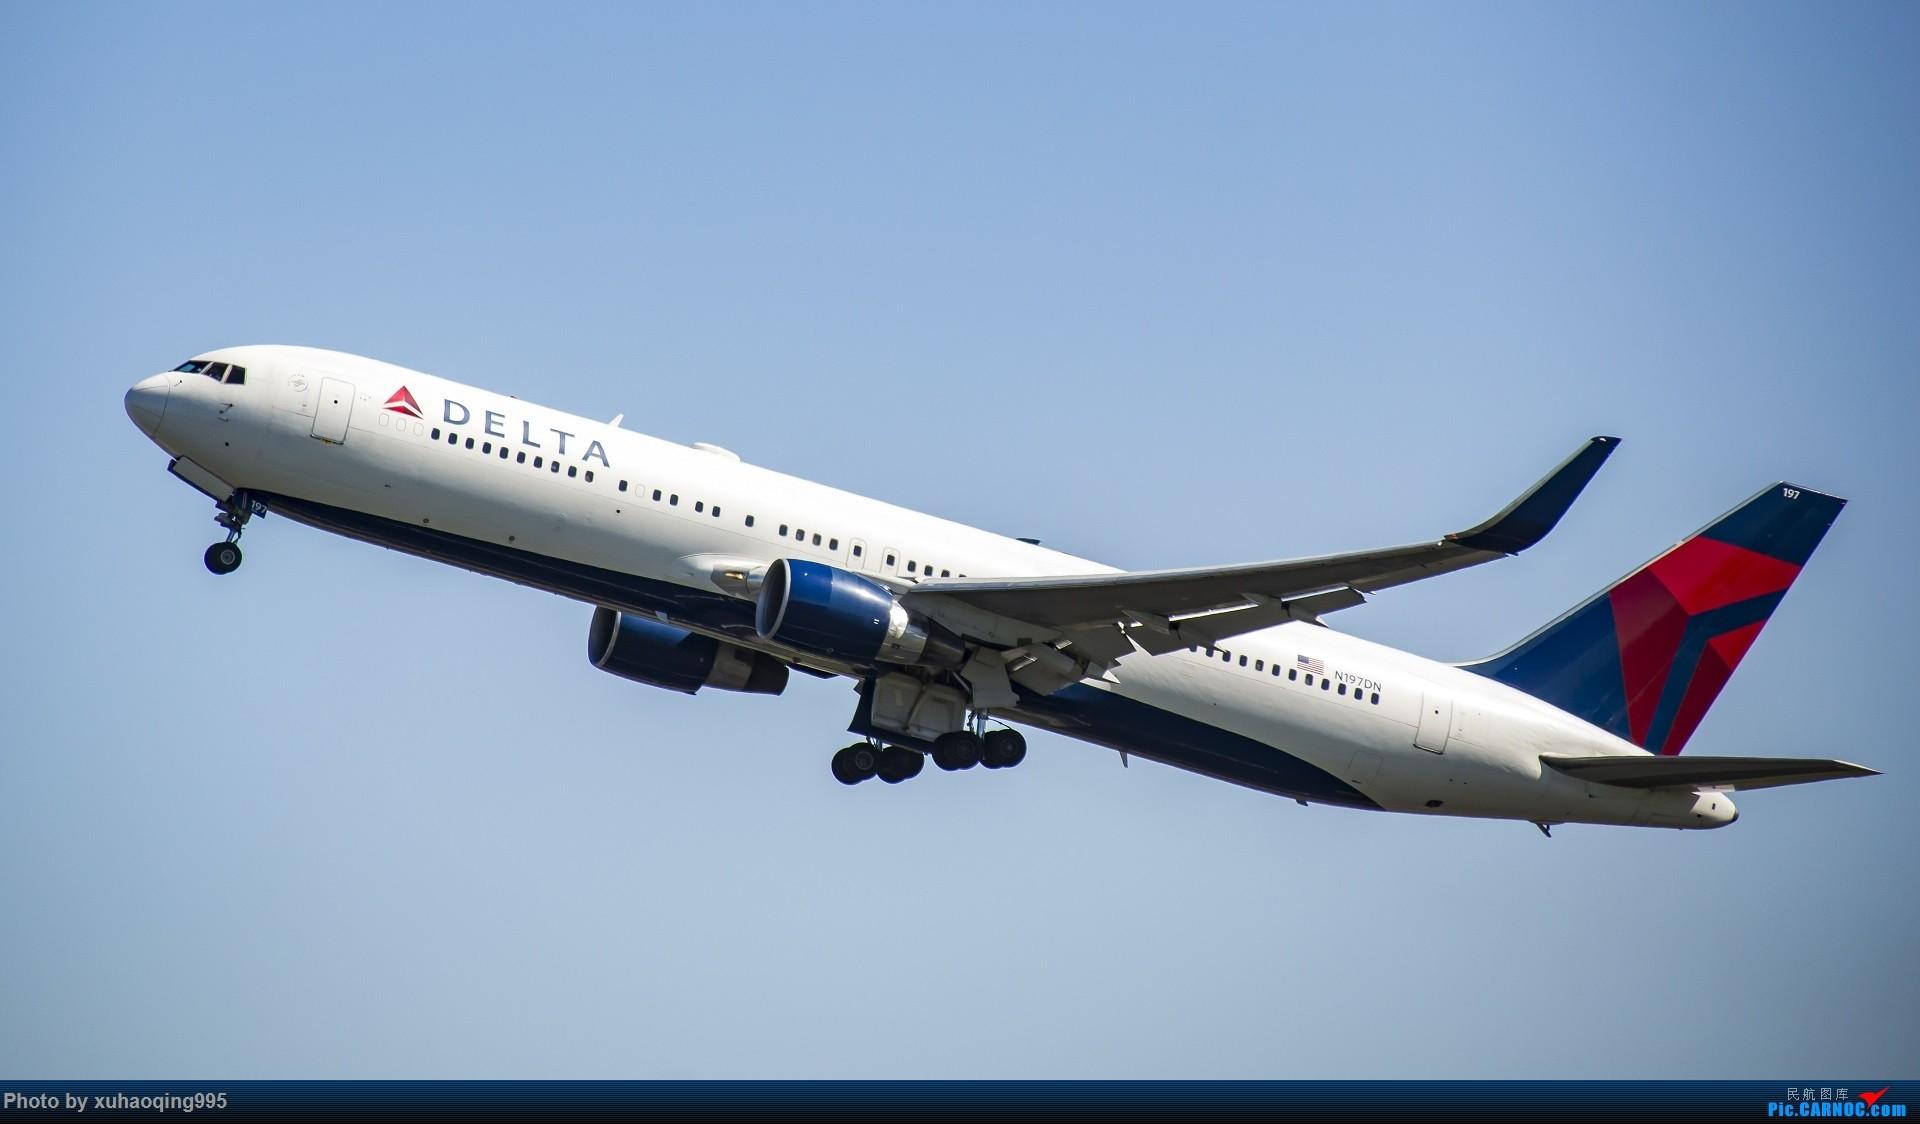 Re:[原创]罗马机场(FCO)拍机 BOEING 767-300 N197DN 意大利菲乌米奇诺机场